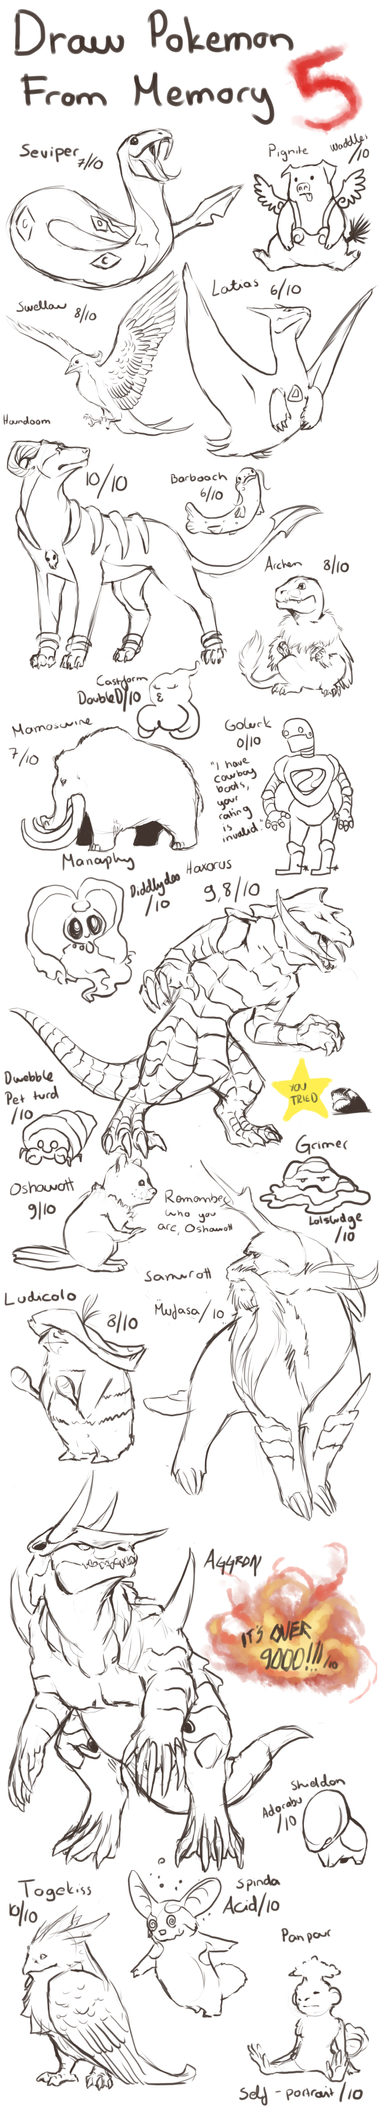 Draw Pokemon From Memory 5 by ShadeofShinon on DeviantArt